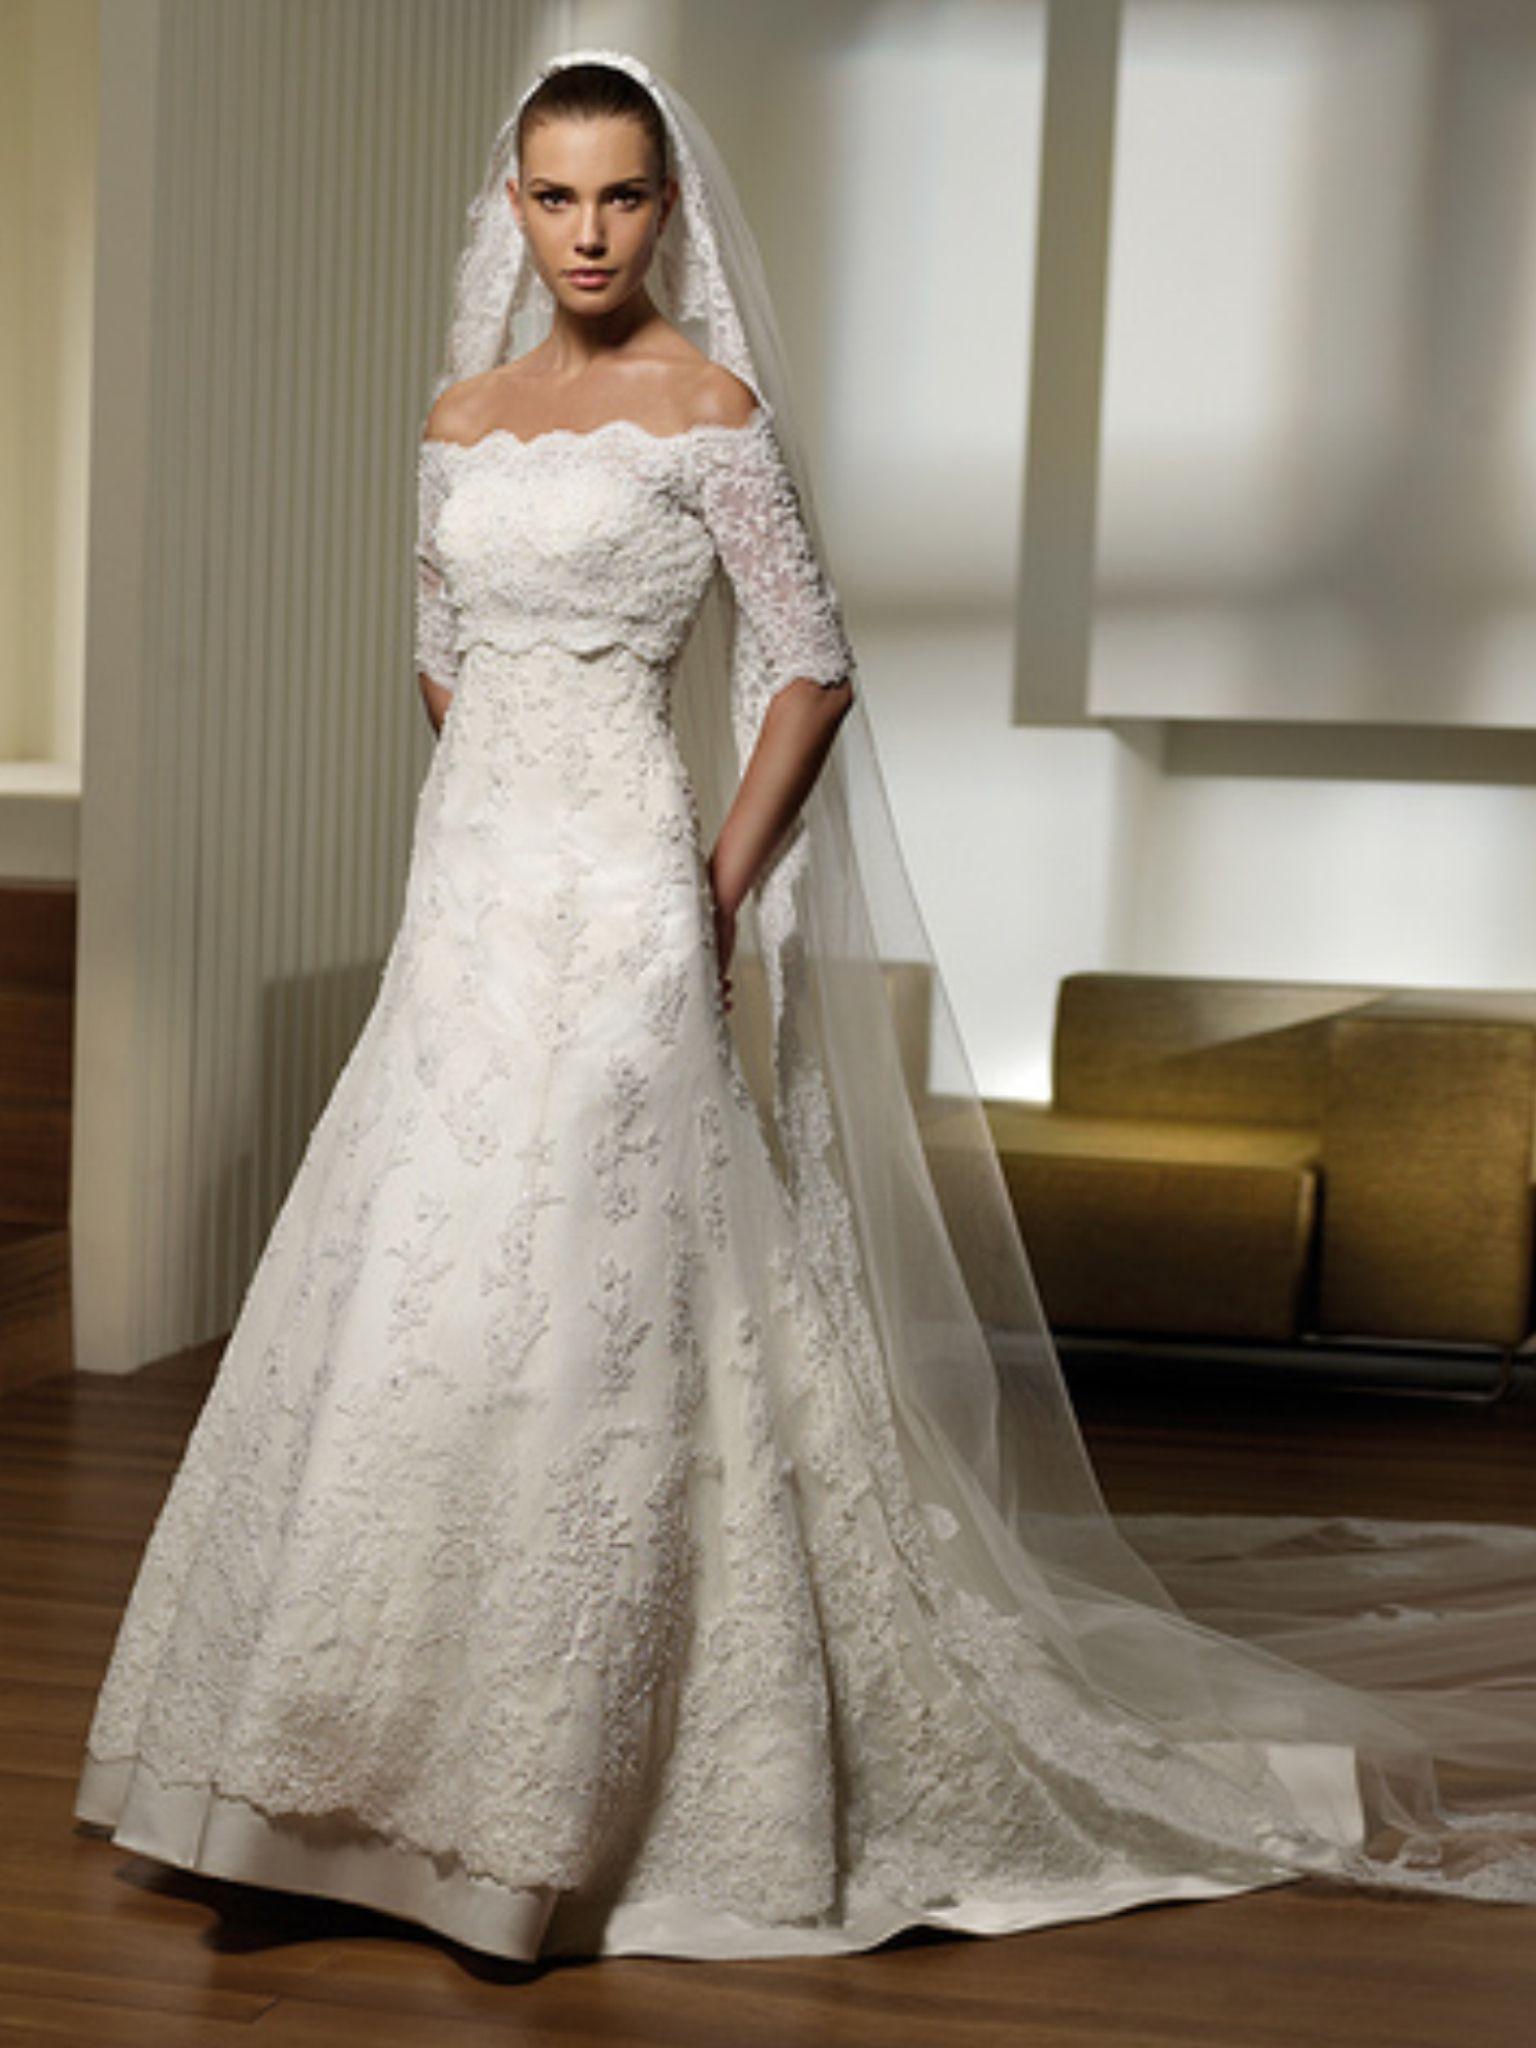 Spanish style wedding dress | One day | Pinterest ...